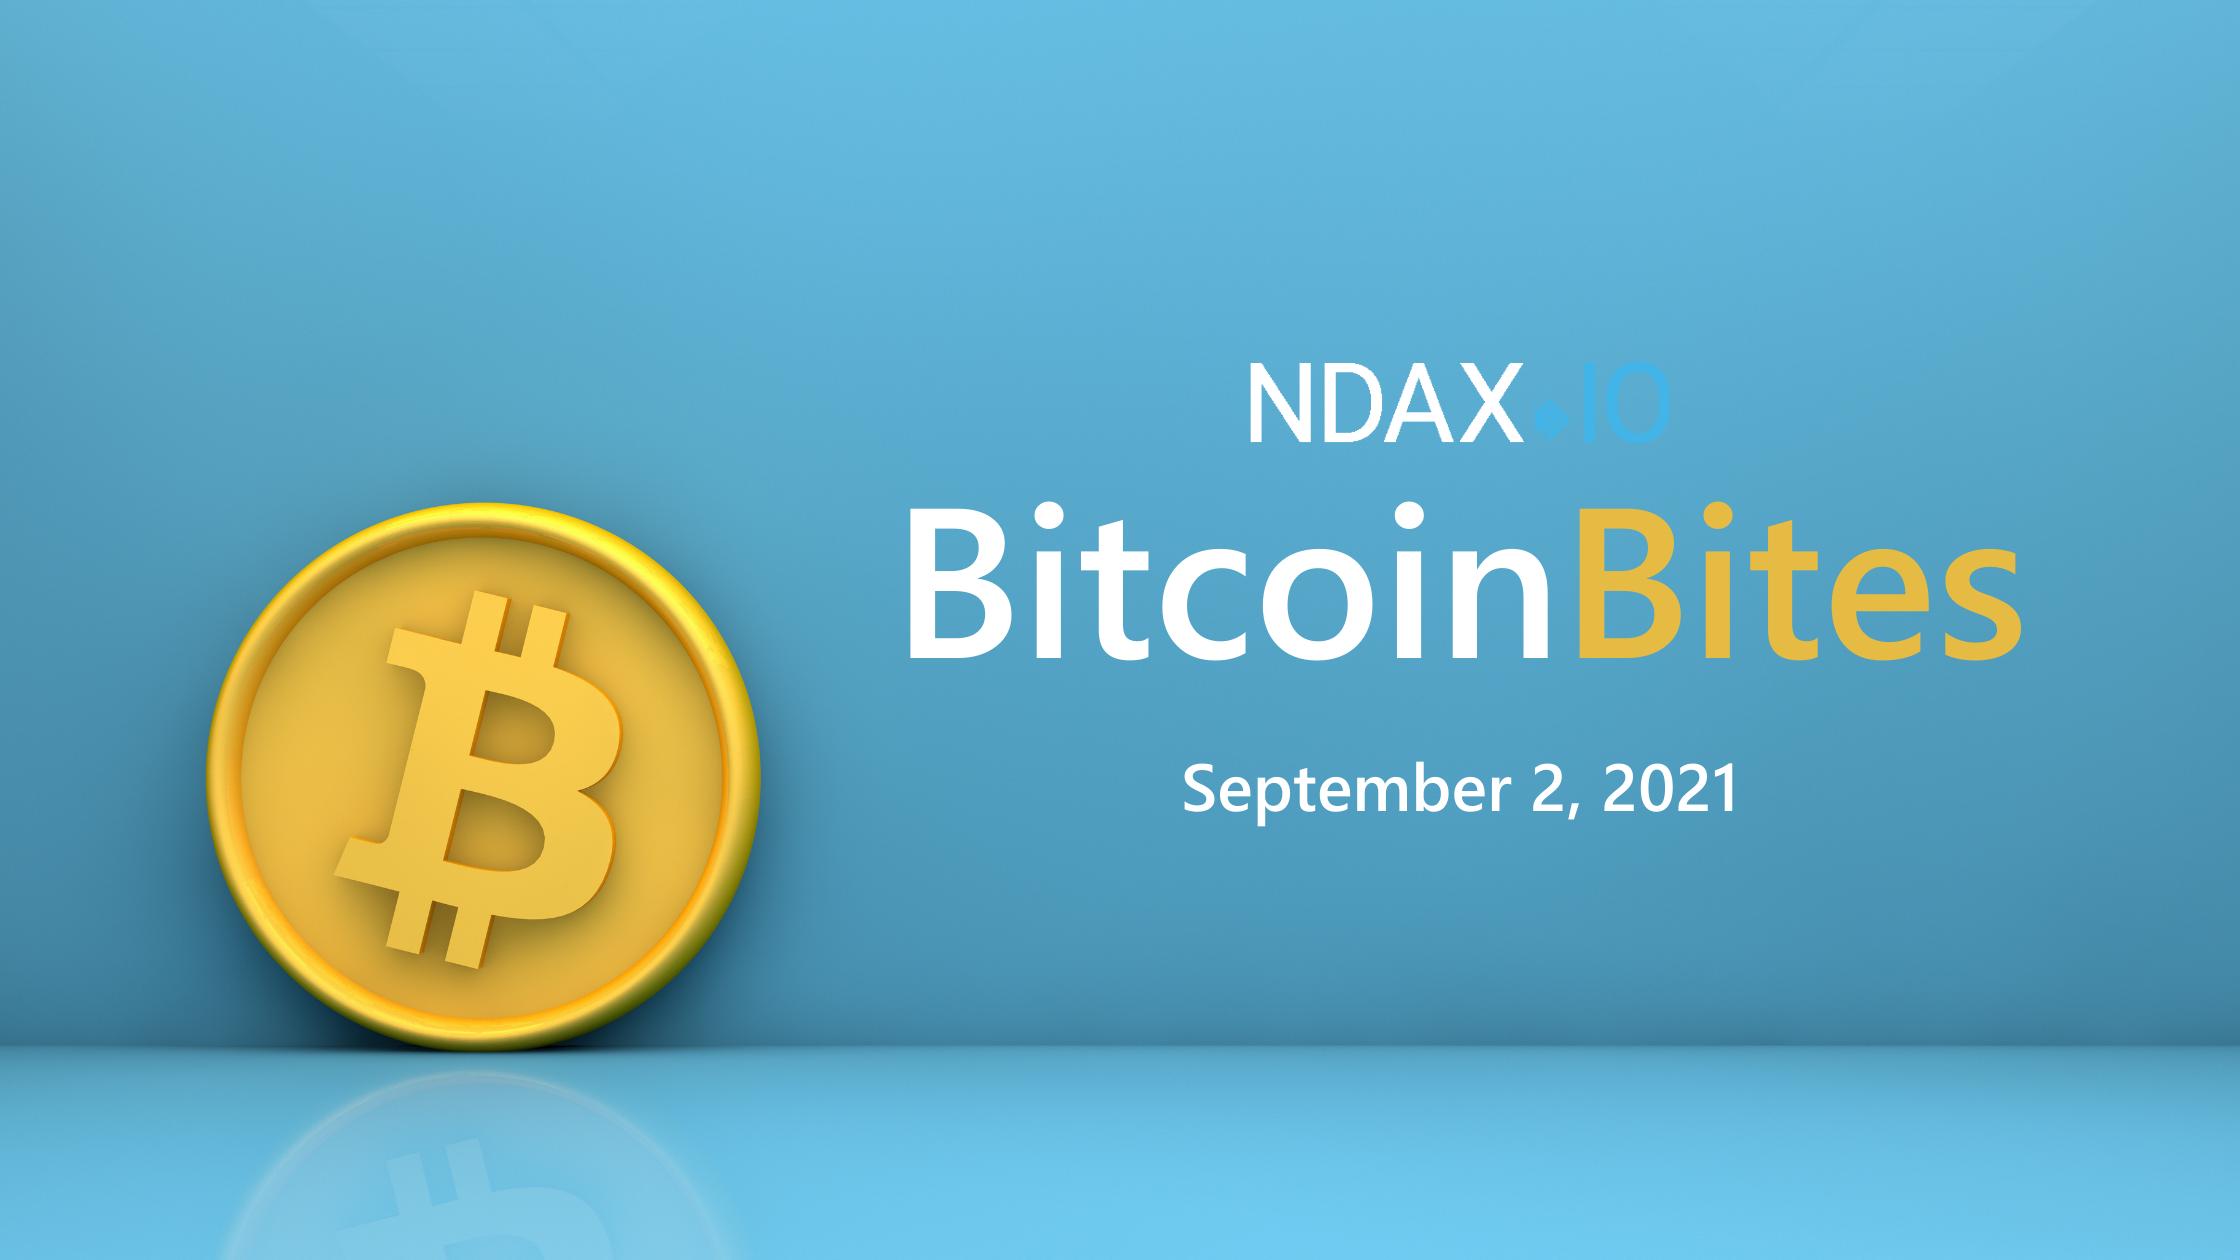 Bitcoin Bites: 5 BTC stories you should know - September 2, 2021